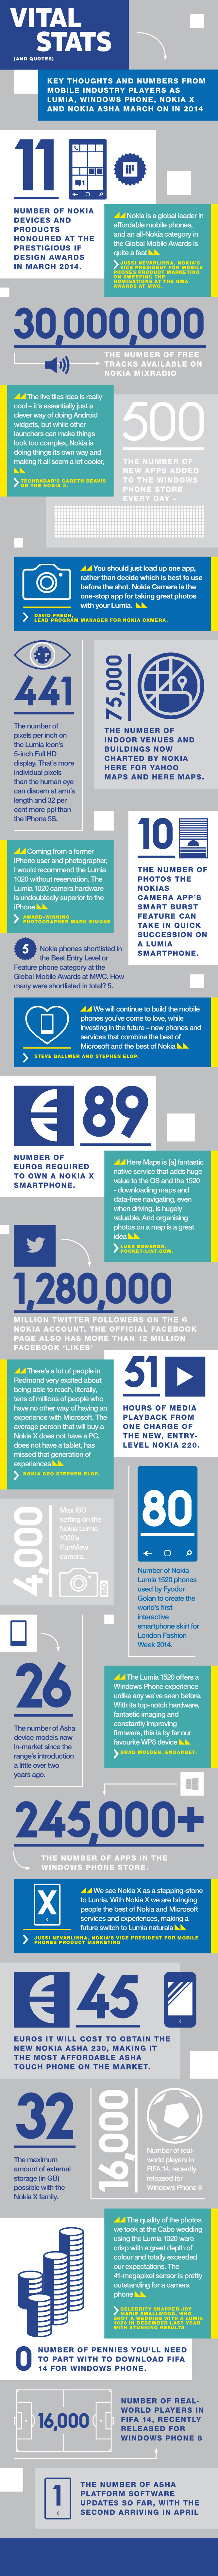 Vital-Stats-infographic